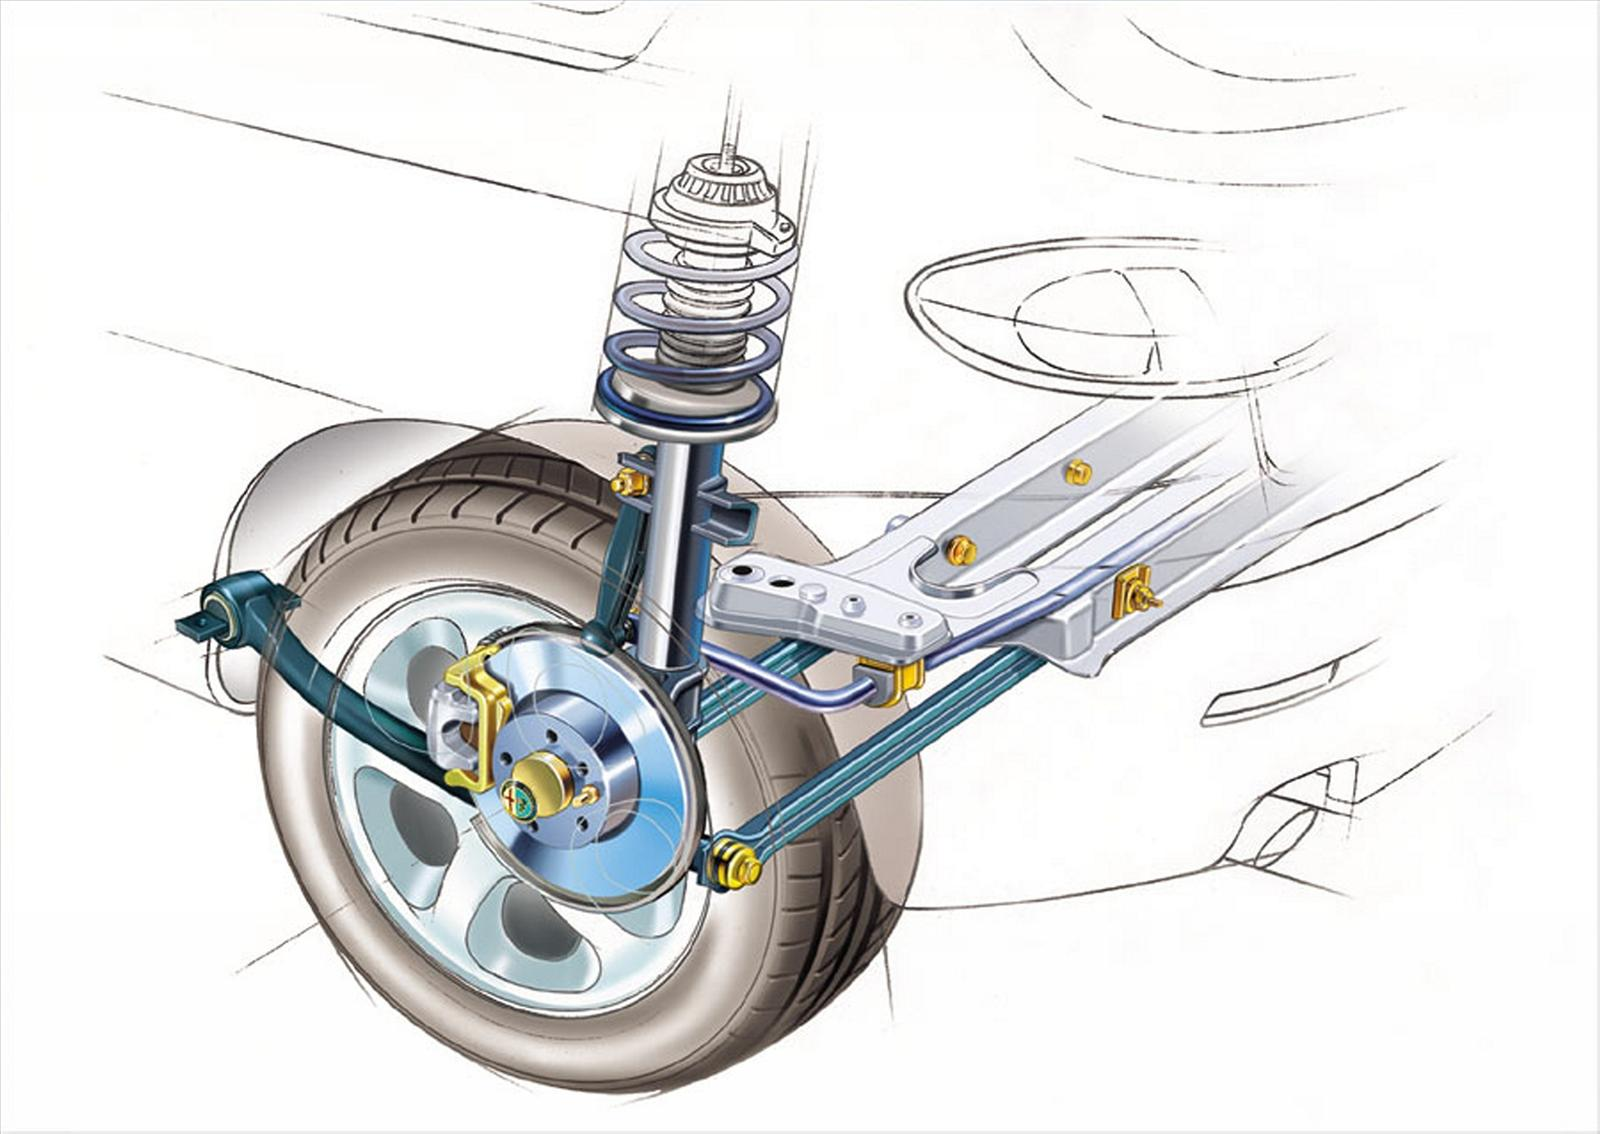 настройка подвески автомобиля схема